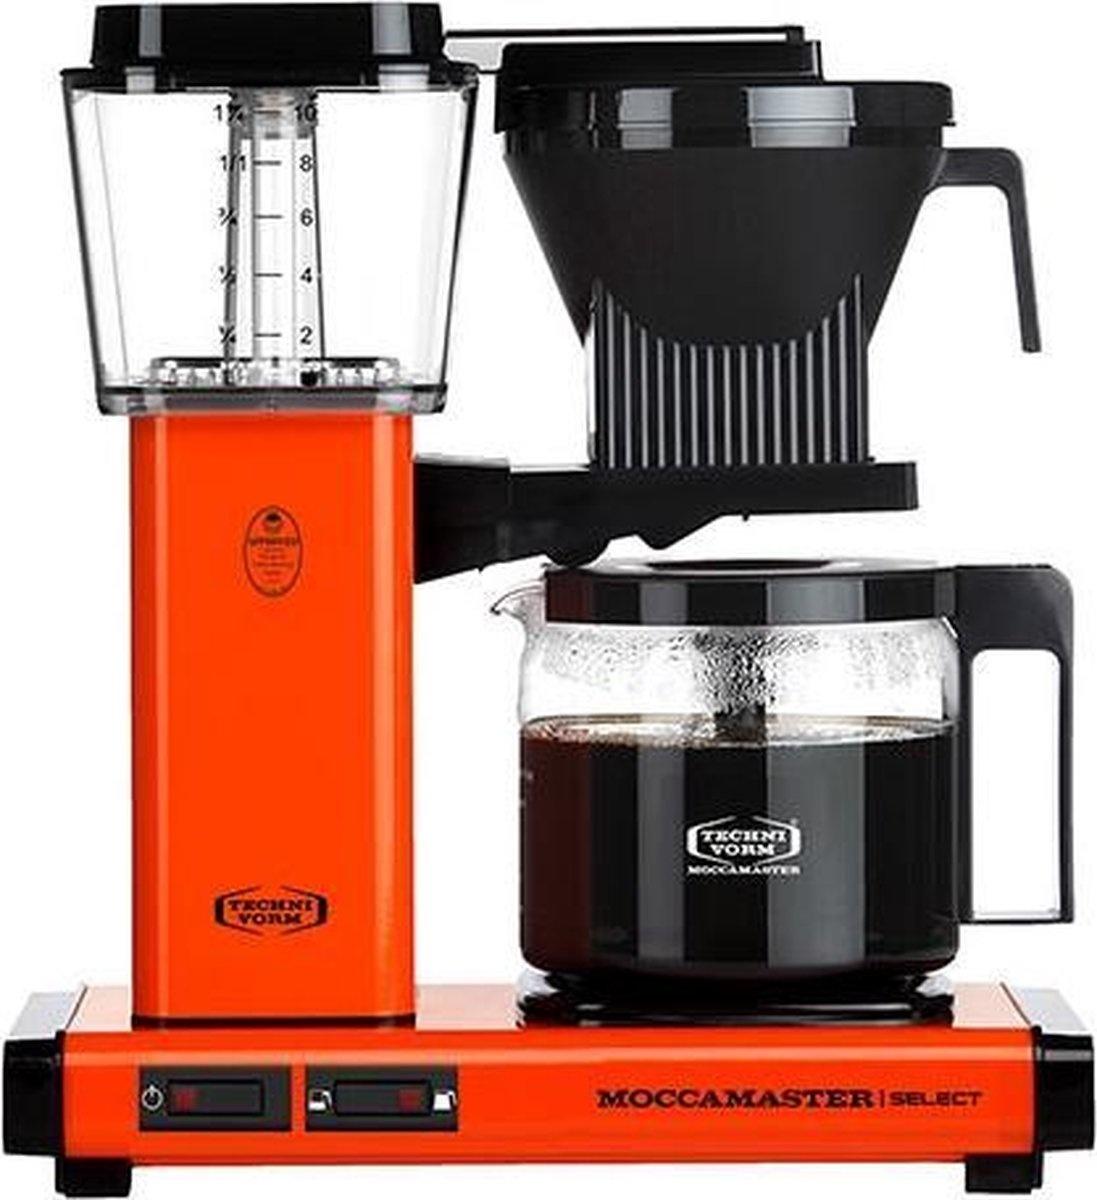 Moccamaster KBG Select Orange koffiezetapparaat met glaskan